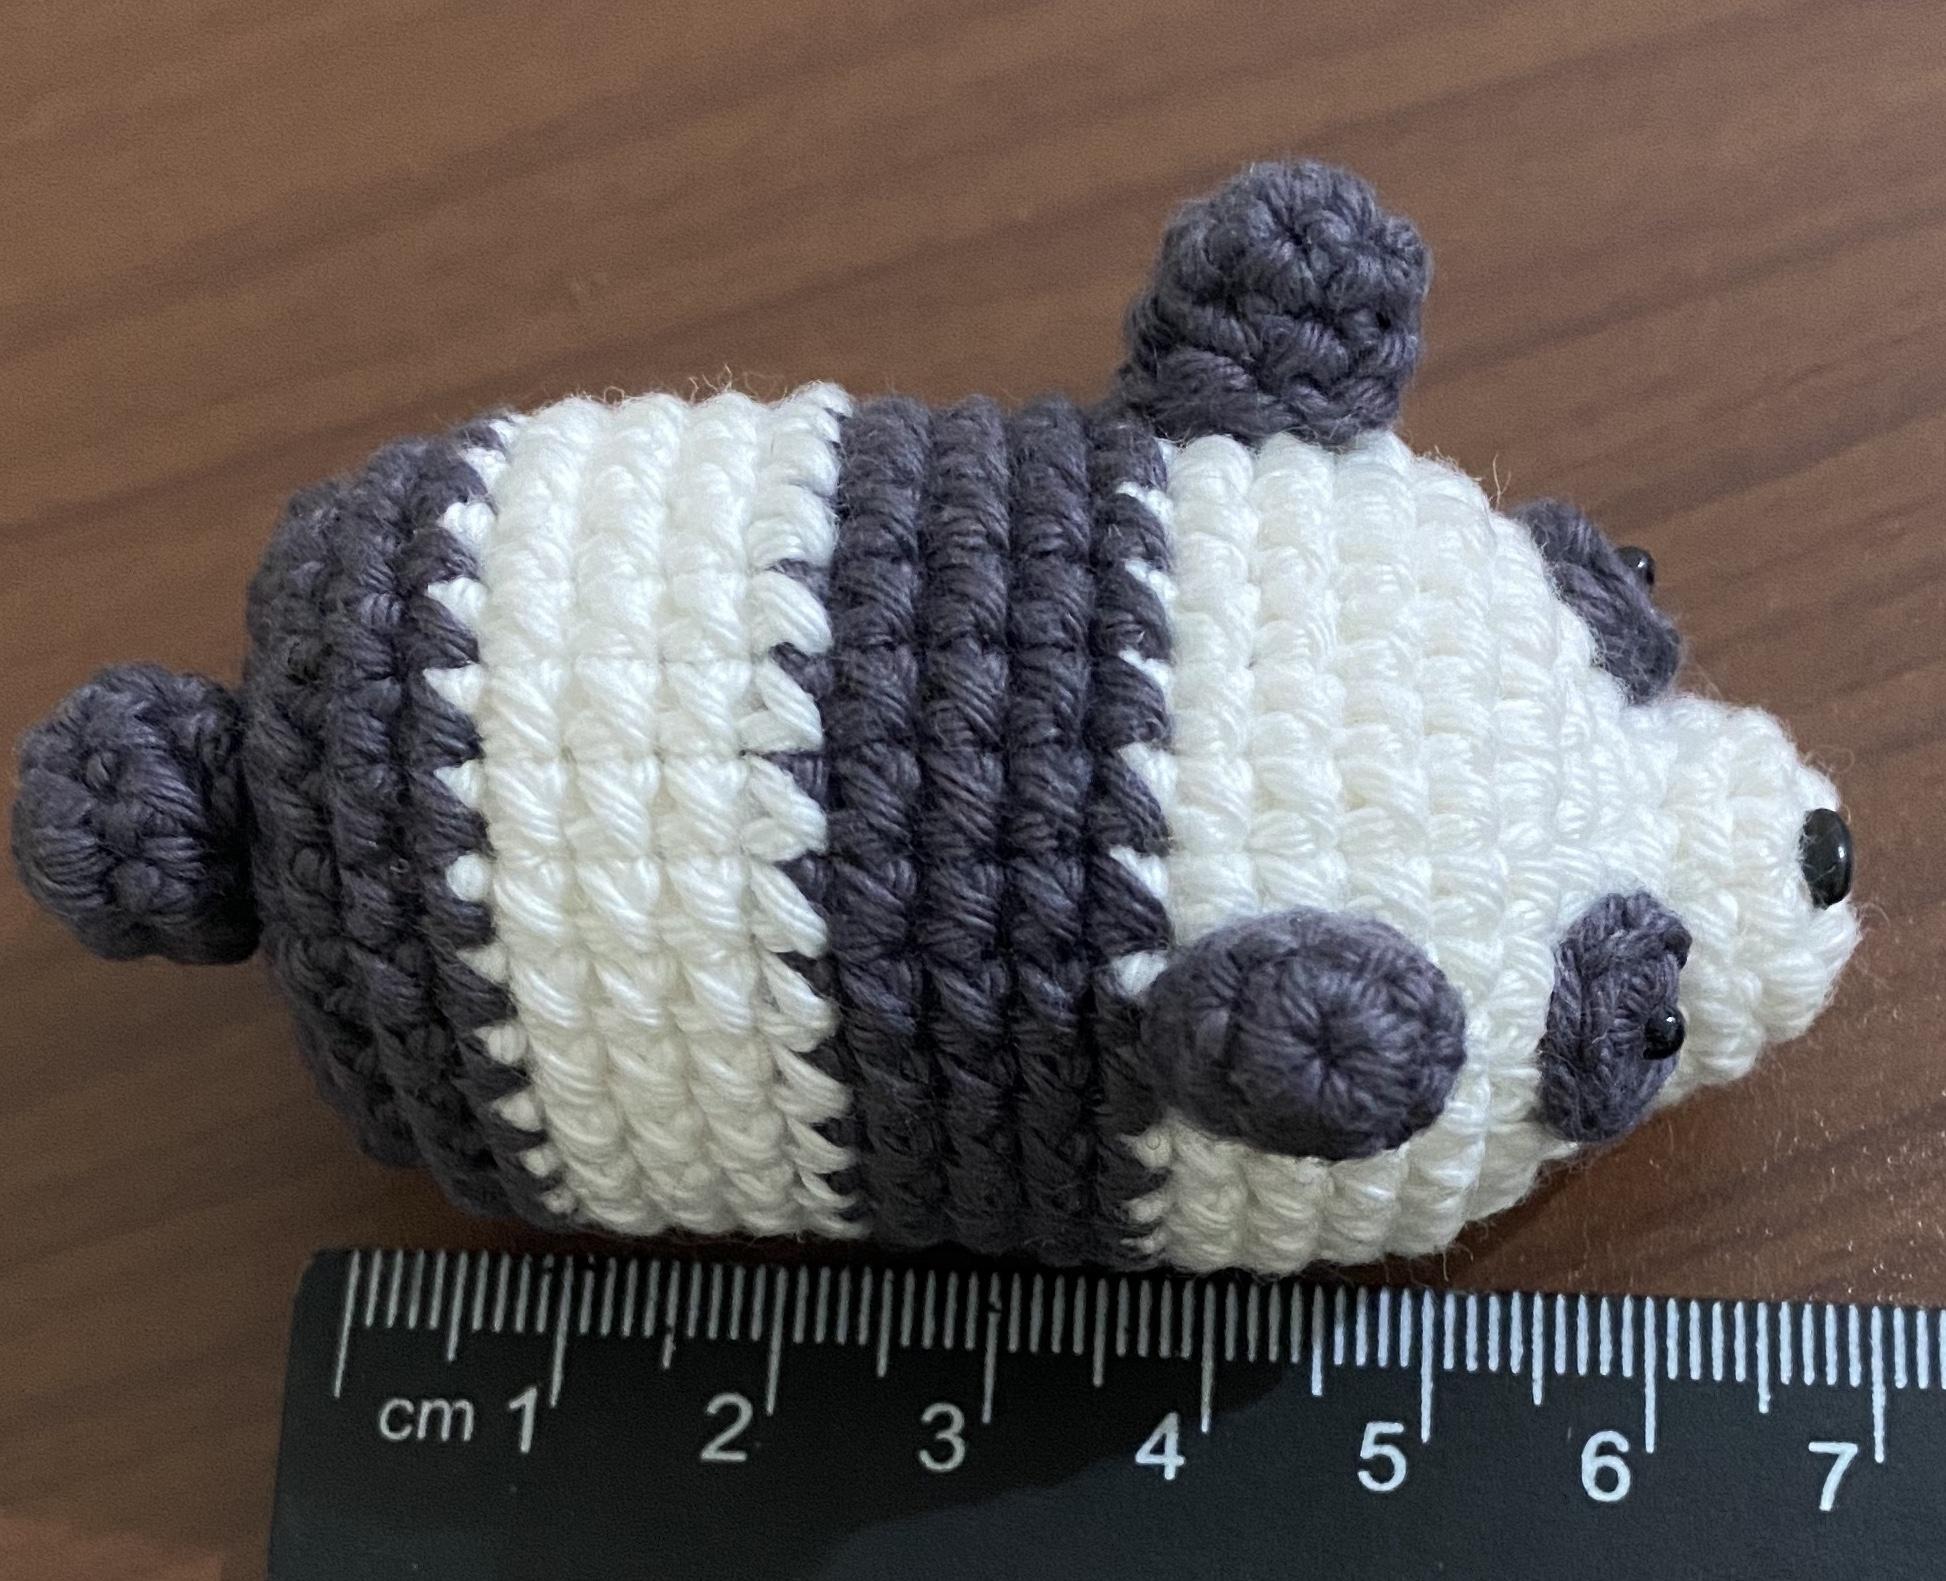 https://storage.googleapis.com/pawlarius-blog-assets/amigurumi/we-bare-bears-chibi/panda-top-position-draft.jpg